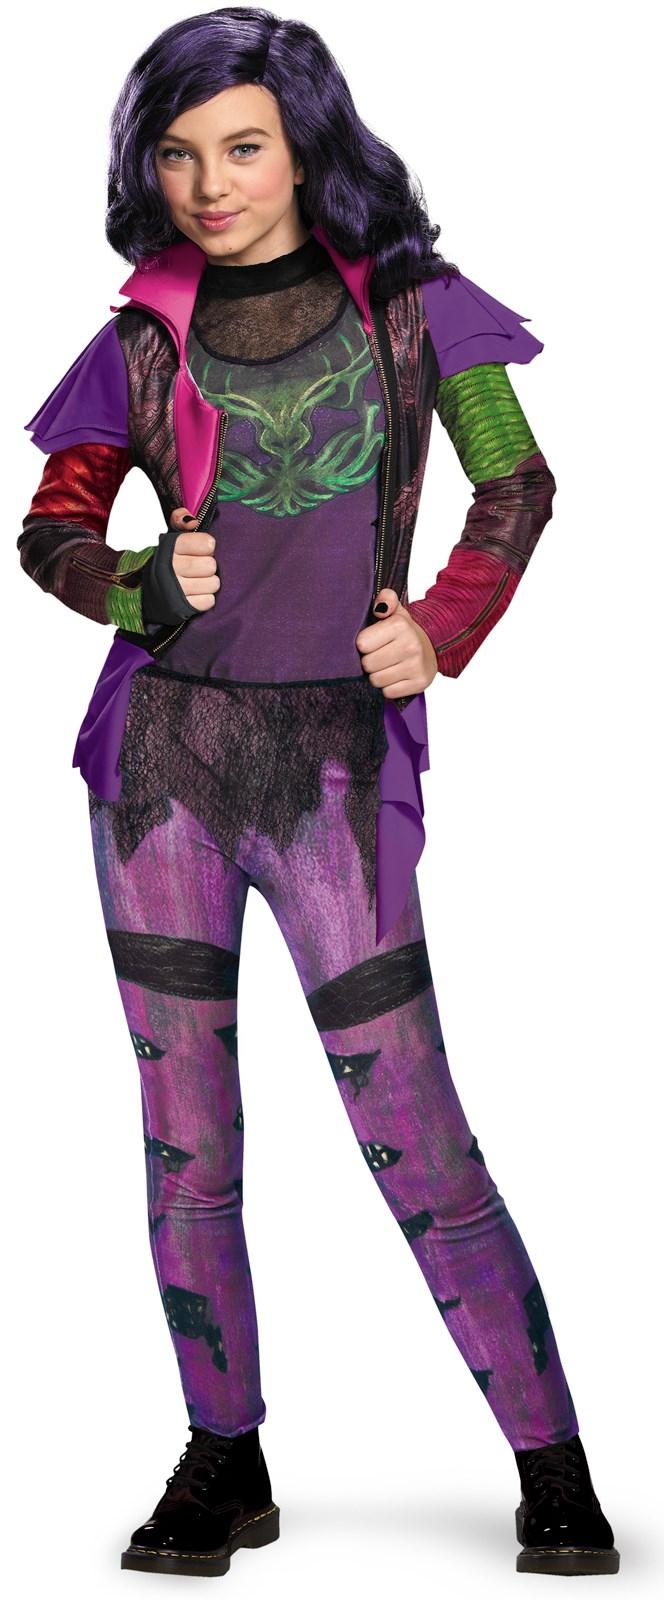 Disneys Descendants: Mal Isle of the Lost Deluxe Costume For Kids